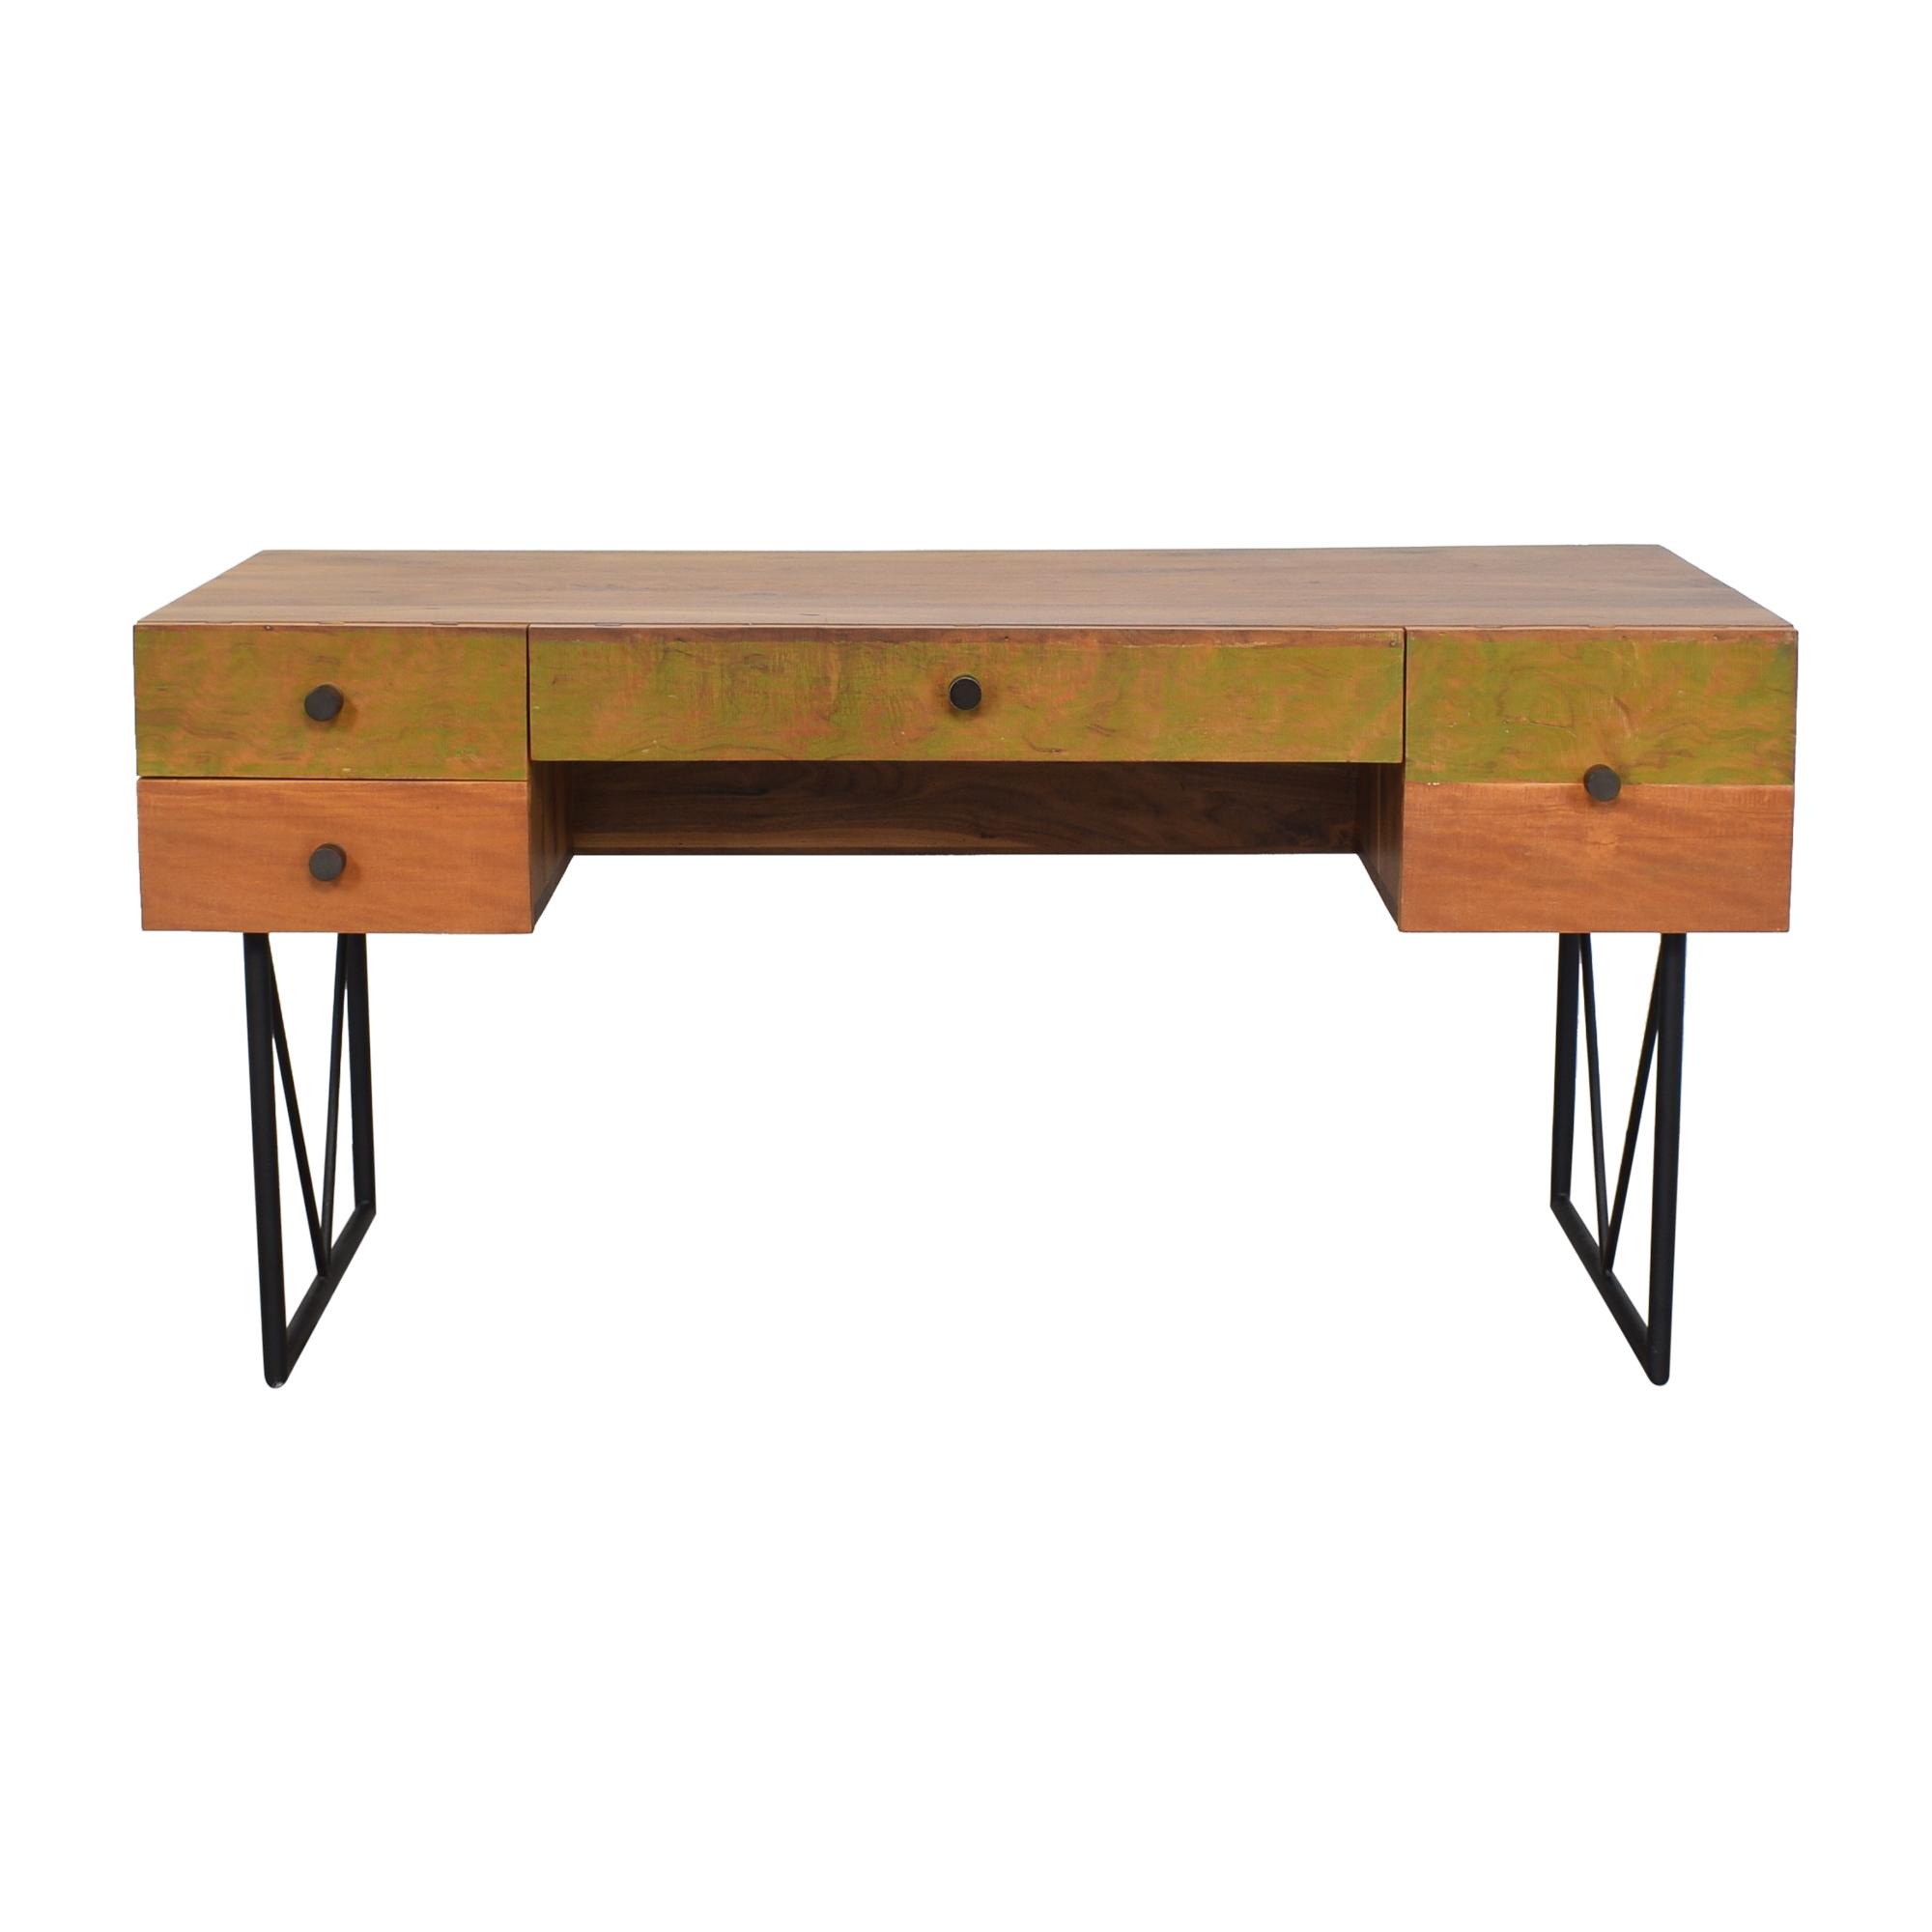 Crate & Barrel Crate & Barrel Atwood Reclaimed Wood Desk Home Office Desks